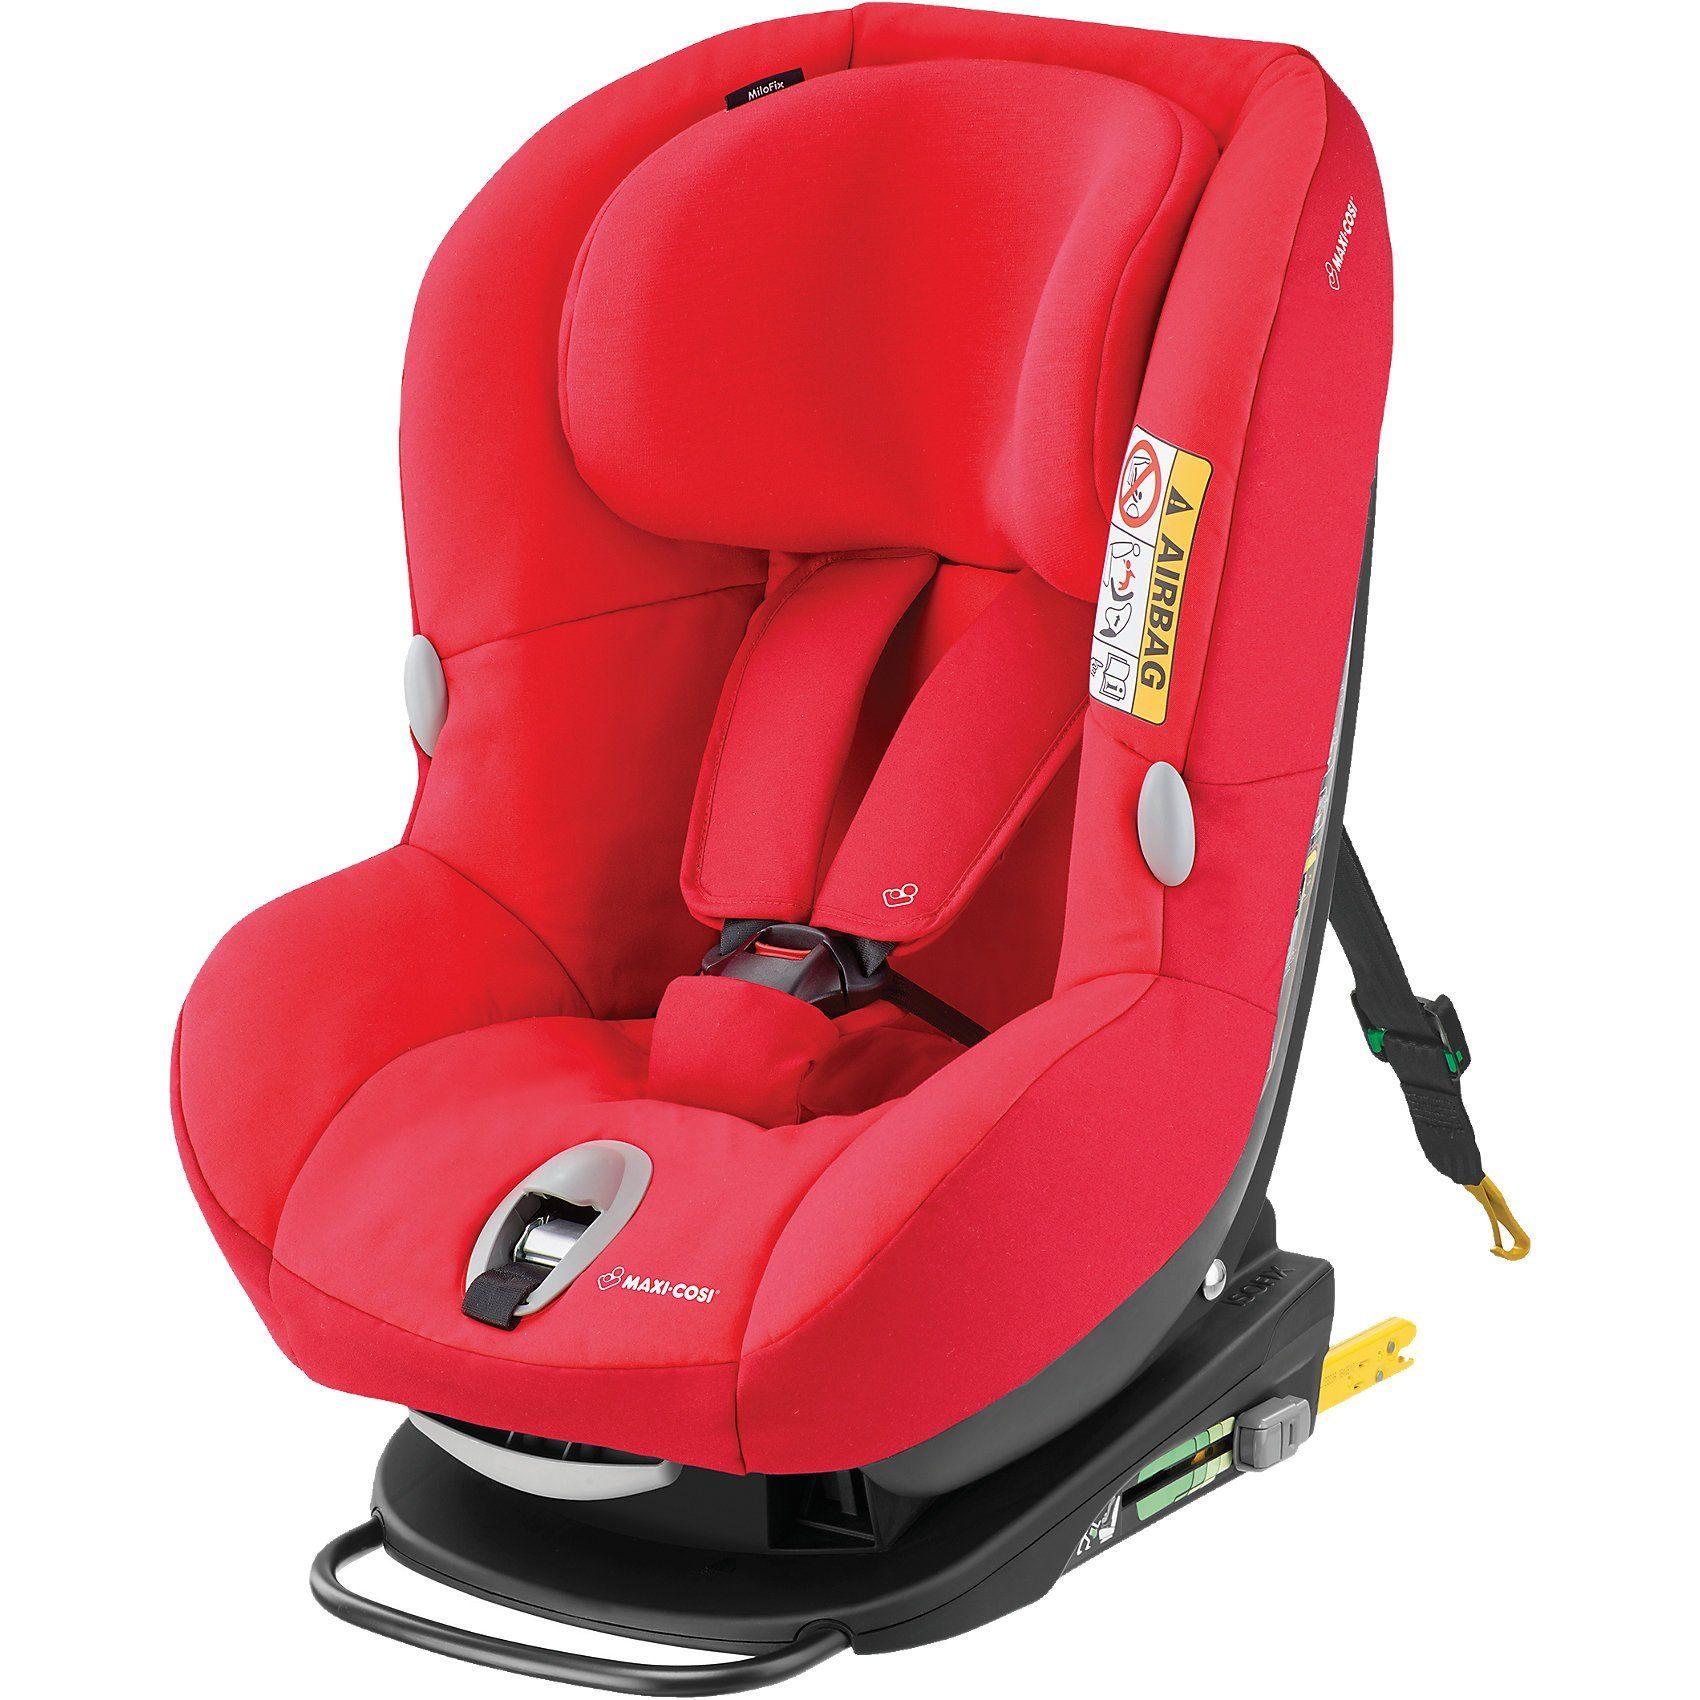 Maxi-Cosi Auto-Kindersitz MiloFix, Vivid Red, 2018